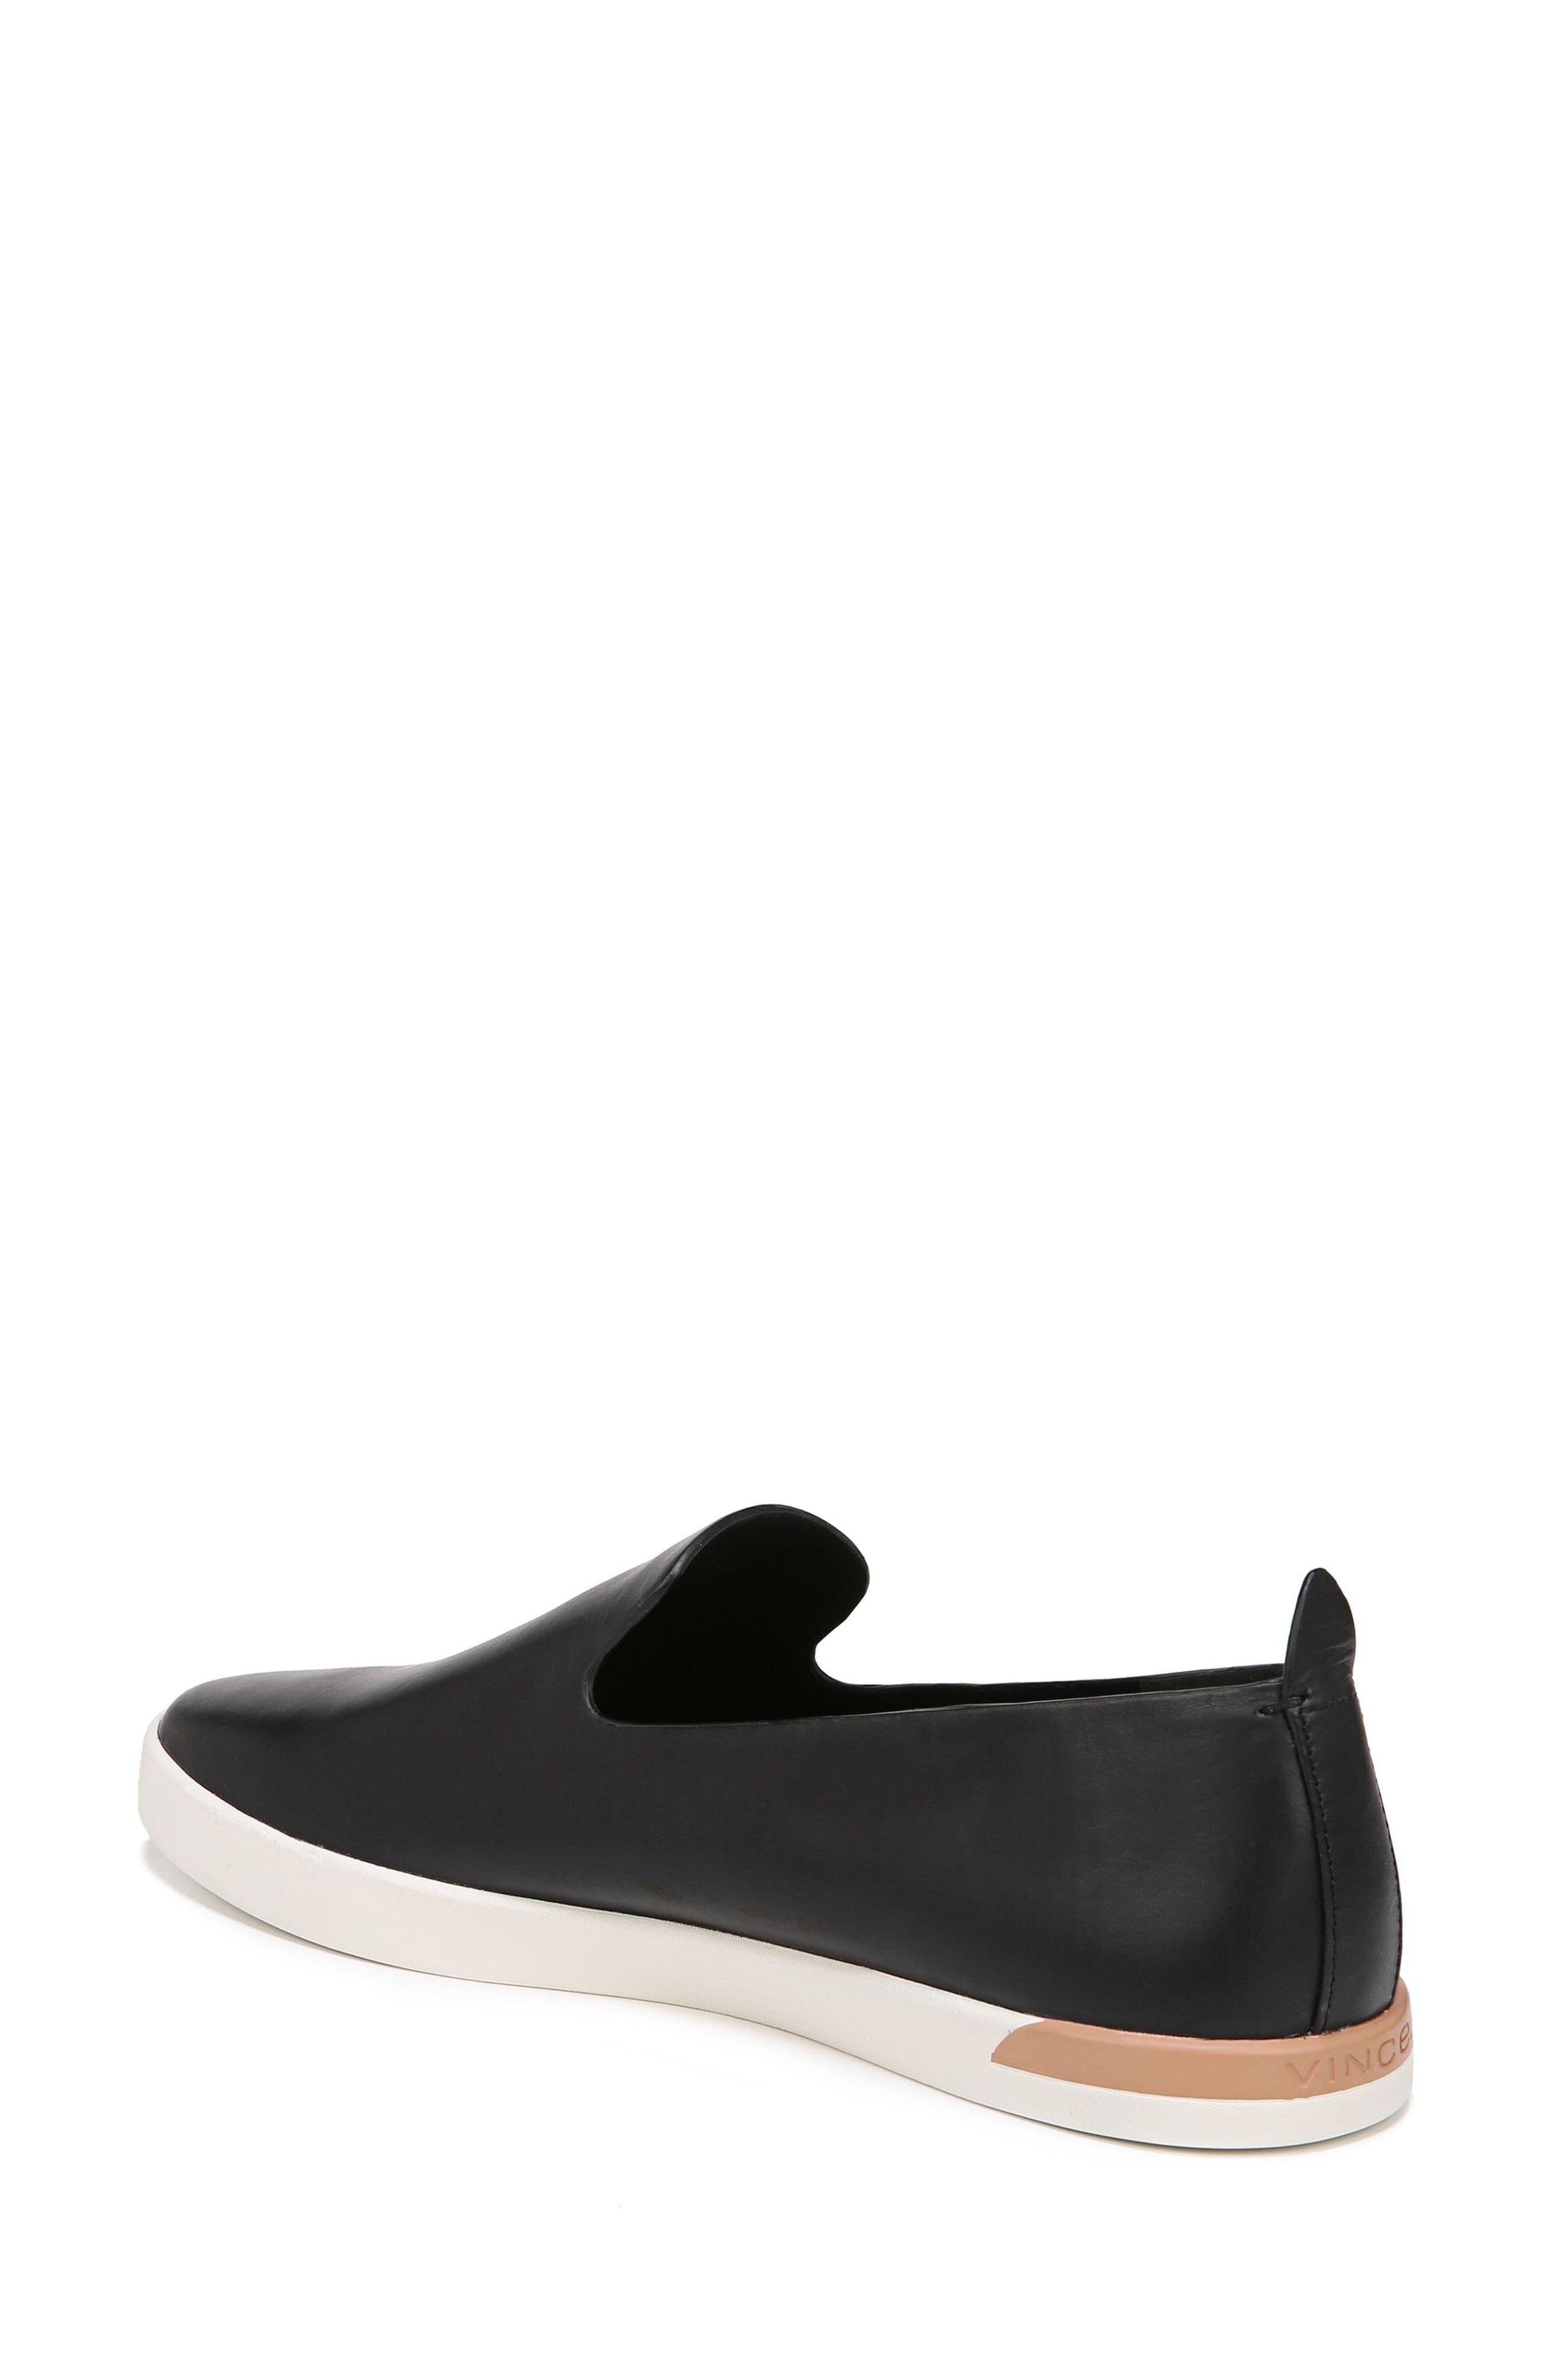 Vero Sneaker,                             Alternate thumbnail 2, color,                             Black Leather